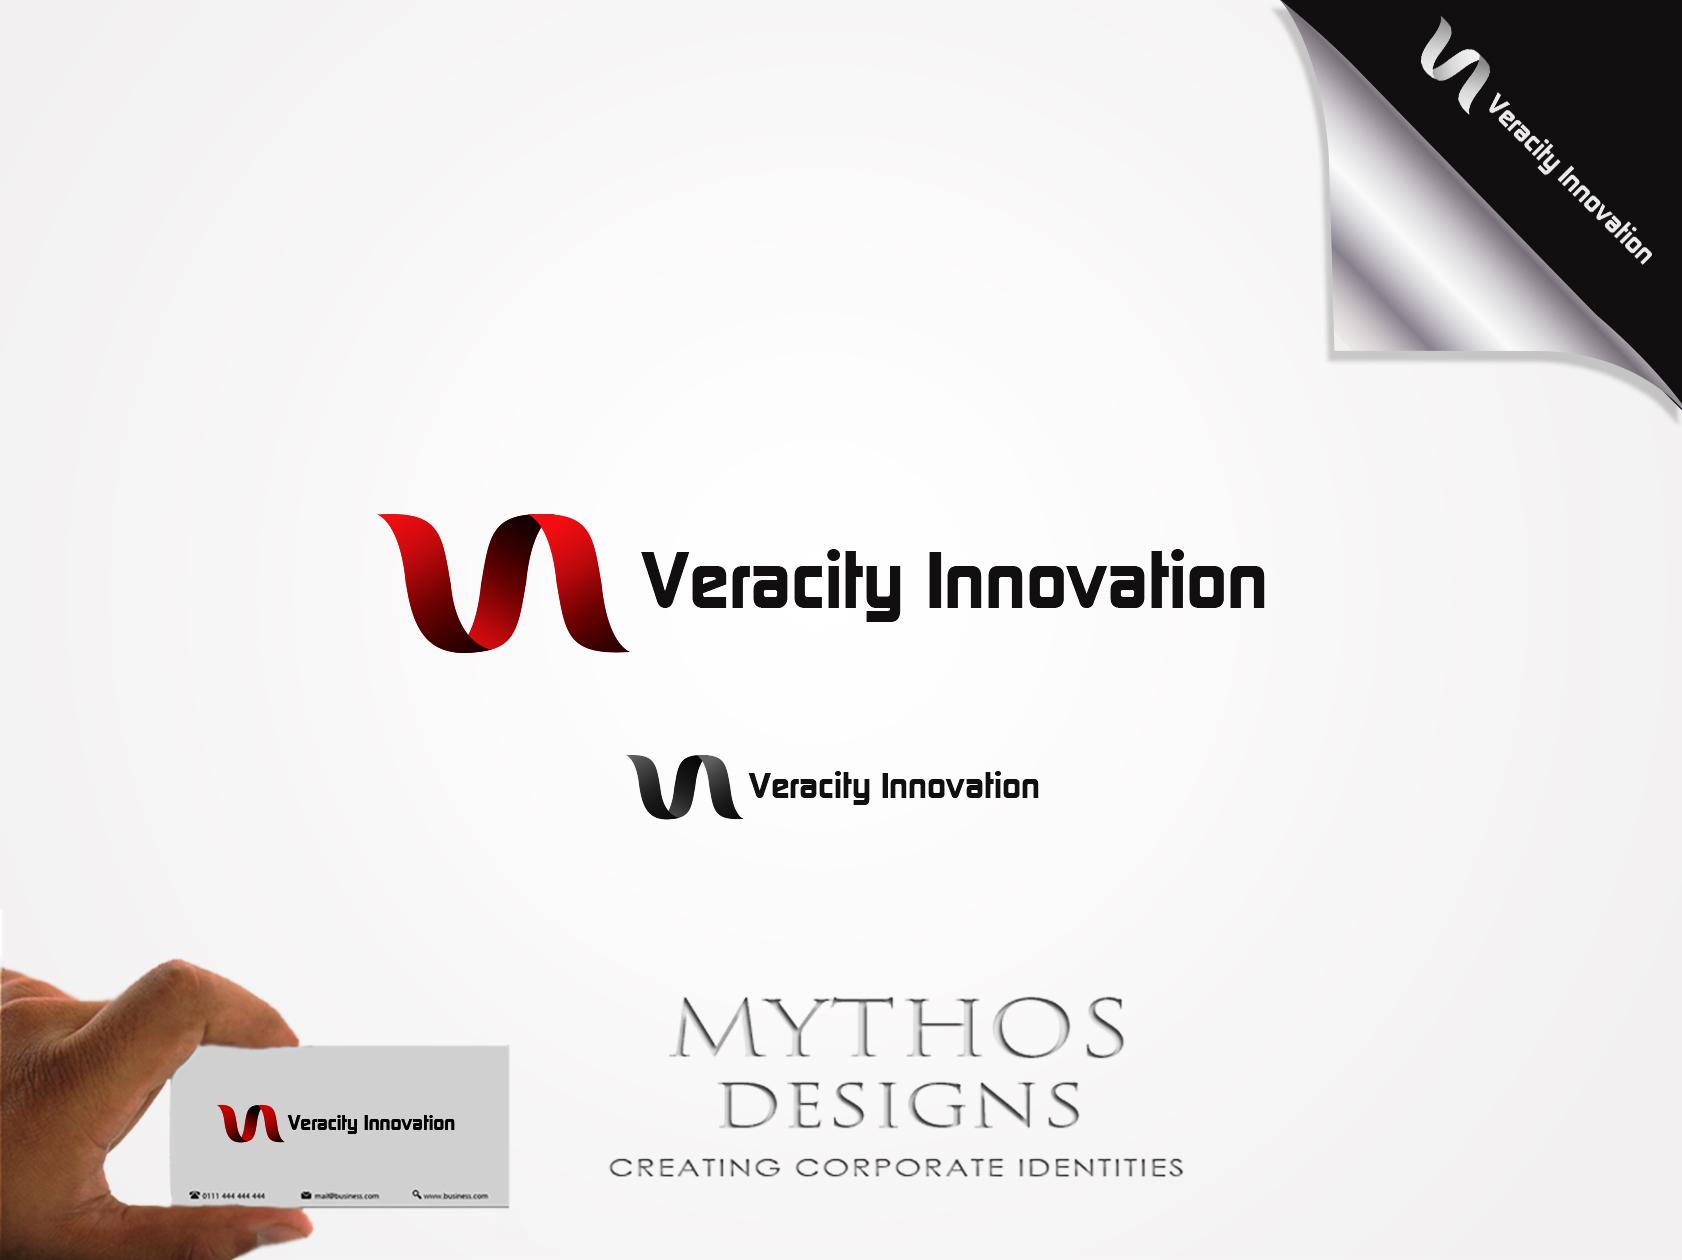 Logo Design by Mythos Designs - Entry No. 254 in the Logo Design Contest Creative Logo Design for Veracity Innovation, LLC.